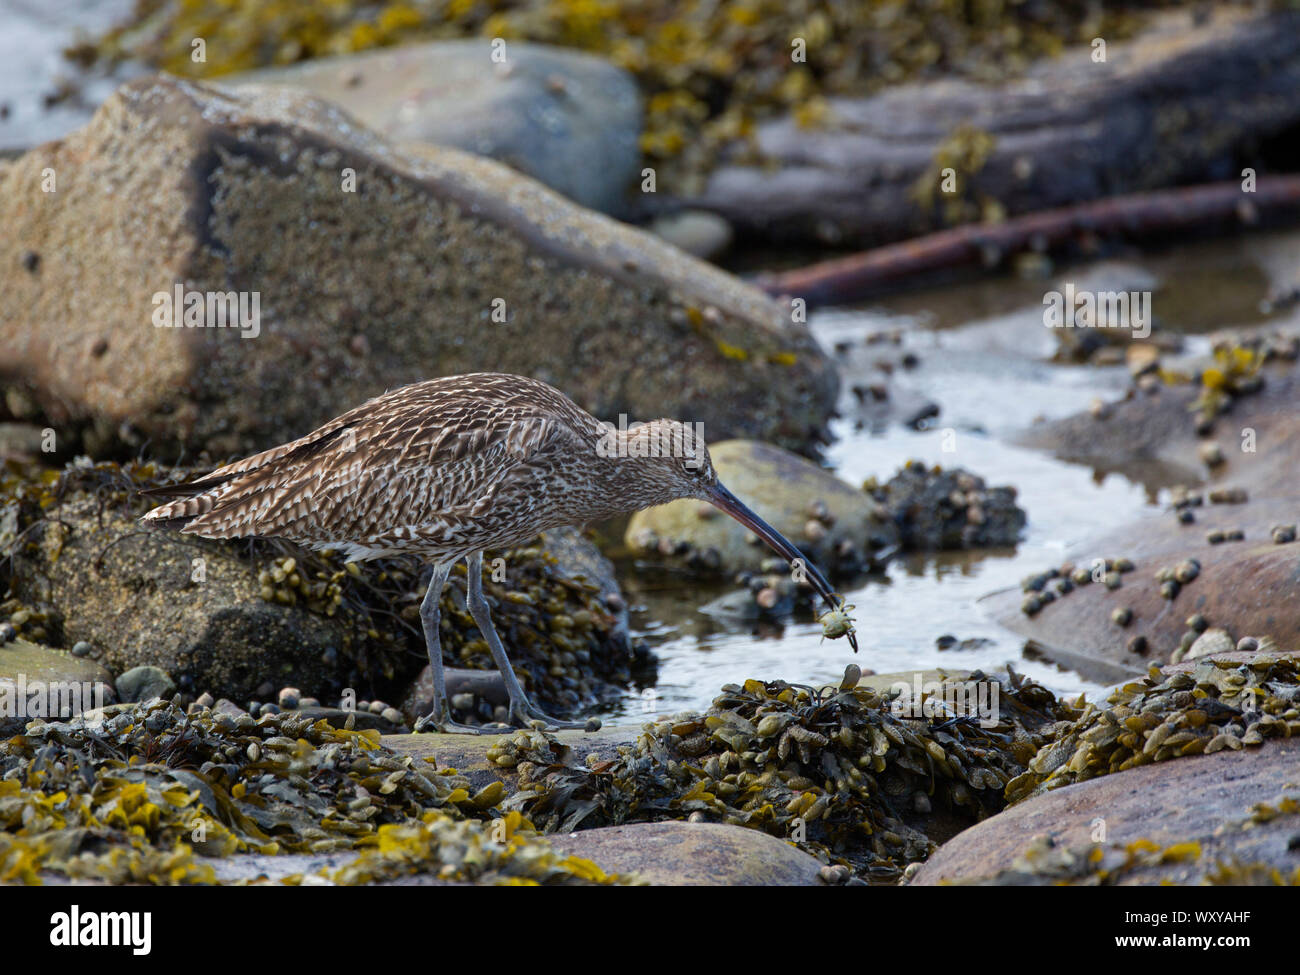 Eurasian Curlew, Numenius arquata, feeding on shellfish in rockpool, Seahouses, Northumberland, UK. Stock Photo